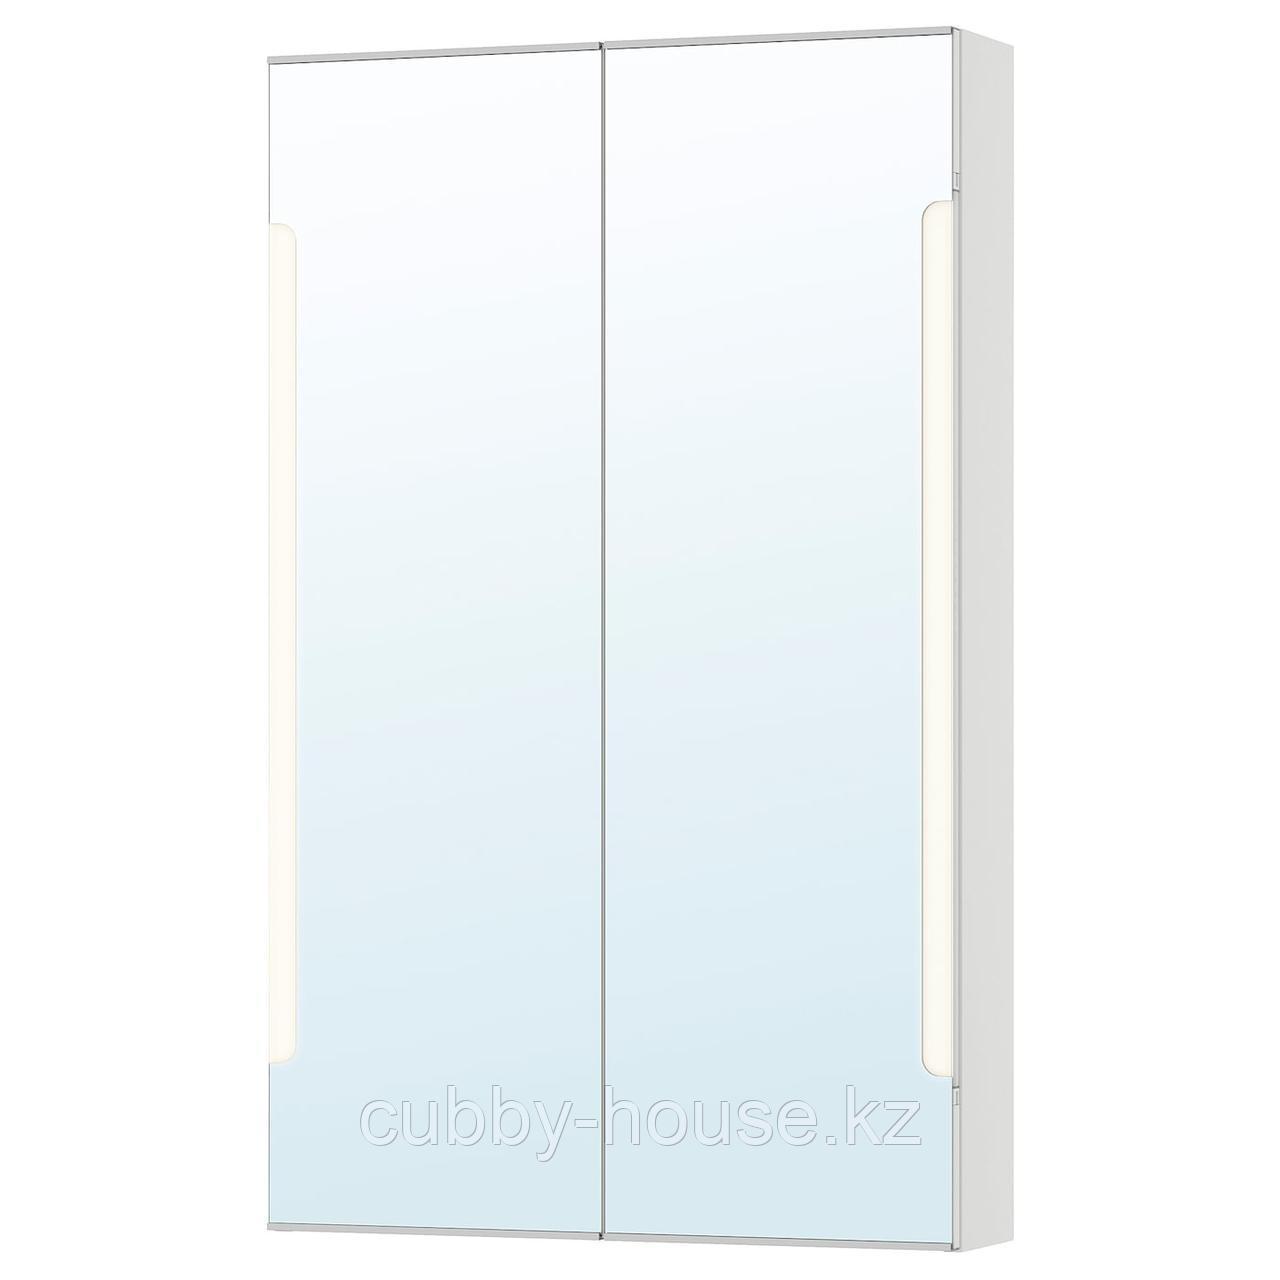 СТОРЙОРМ Зеркальн шкафчик/2дверцы/подсветка, белый, 60x14x96 см